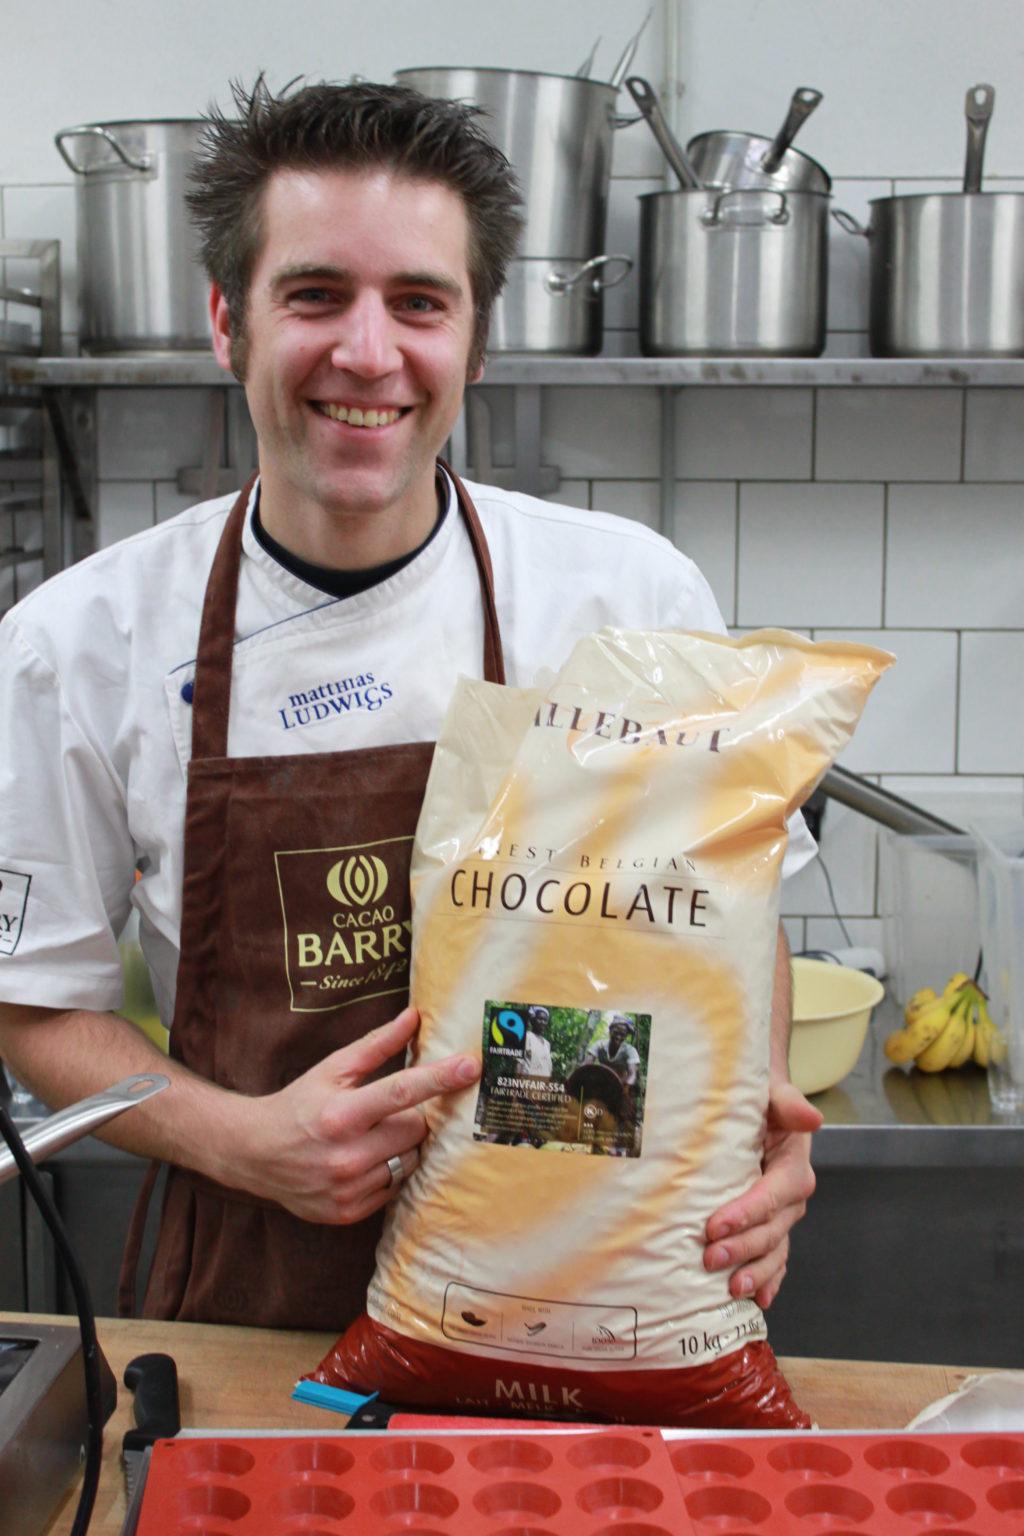 Matthias Ludwigs mit Fairtrade-zertifizierter Schokoladen-Kuvertüre